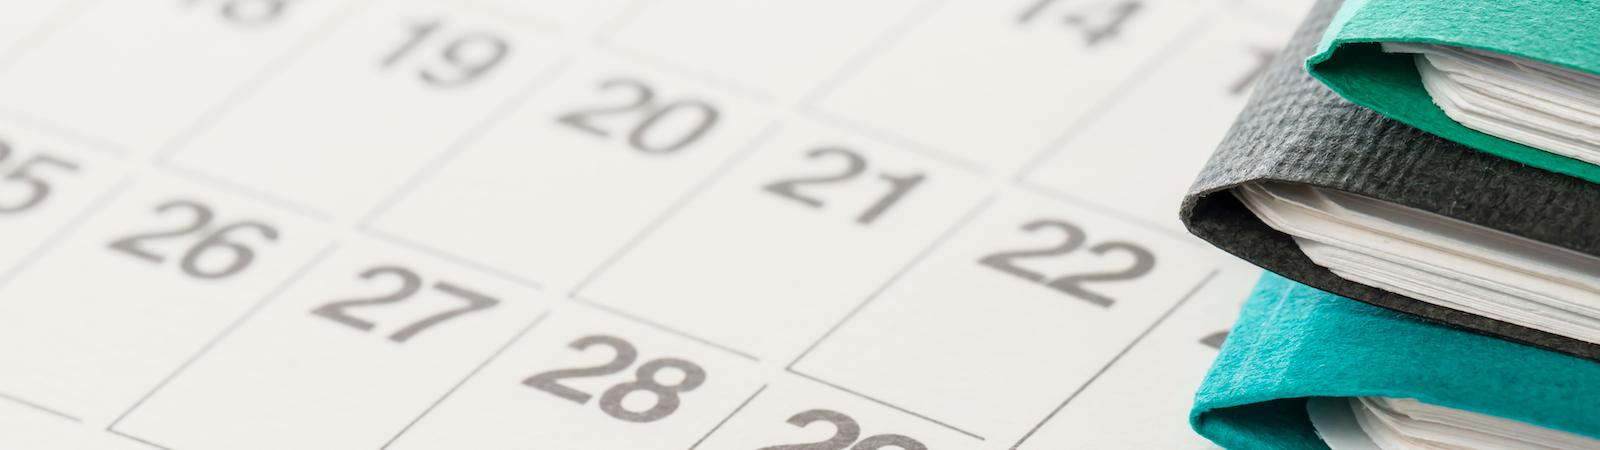 American University Academic Calendar 2022.Academic Calendar Marconi International University